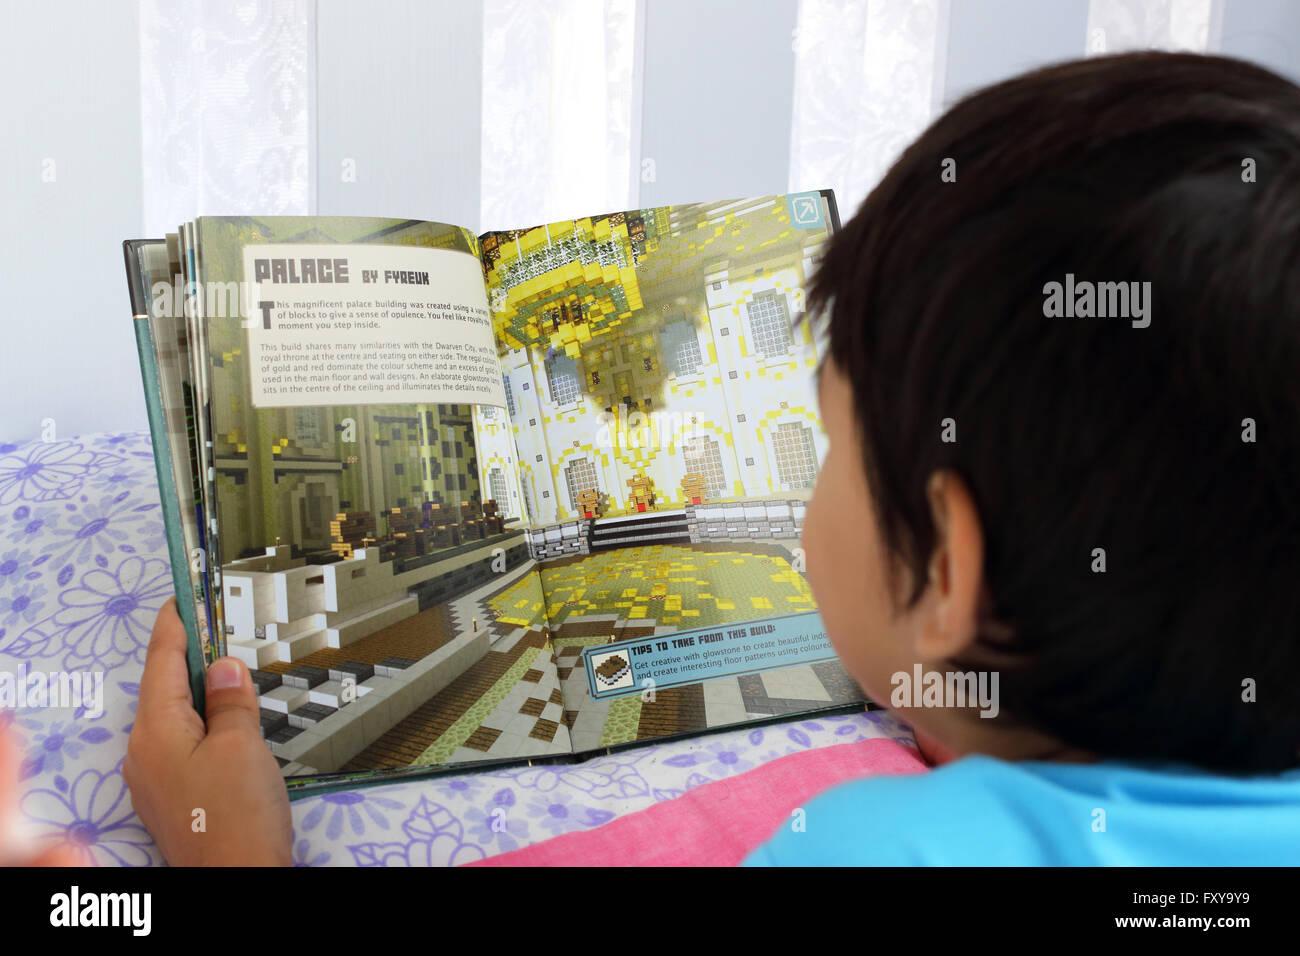 Young Boy Reading Minecraft Book Stock Photos & Young Boy Reading ...